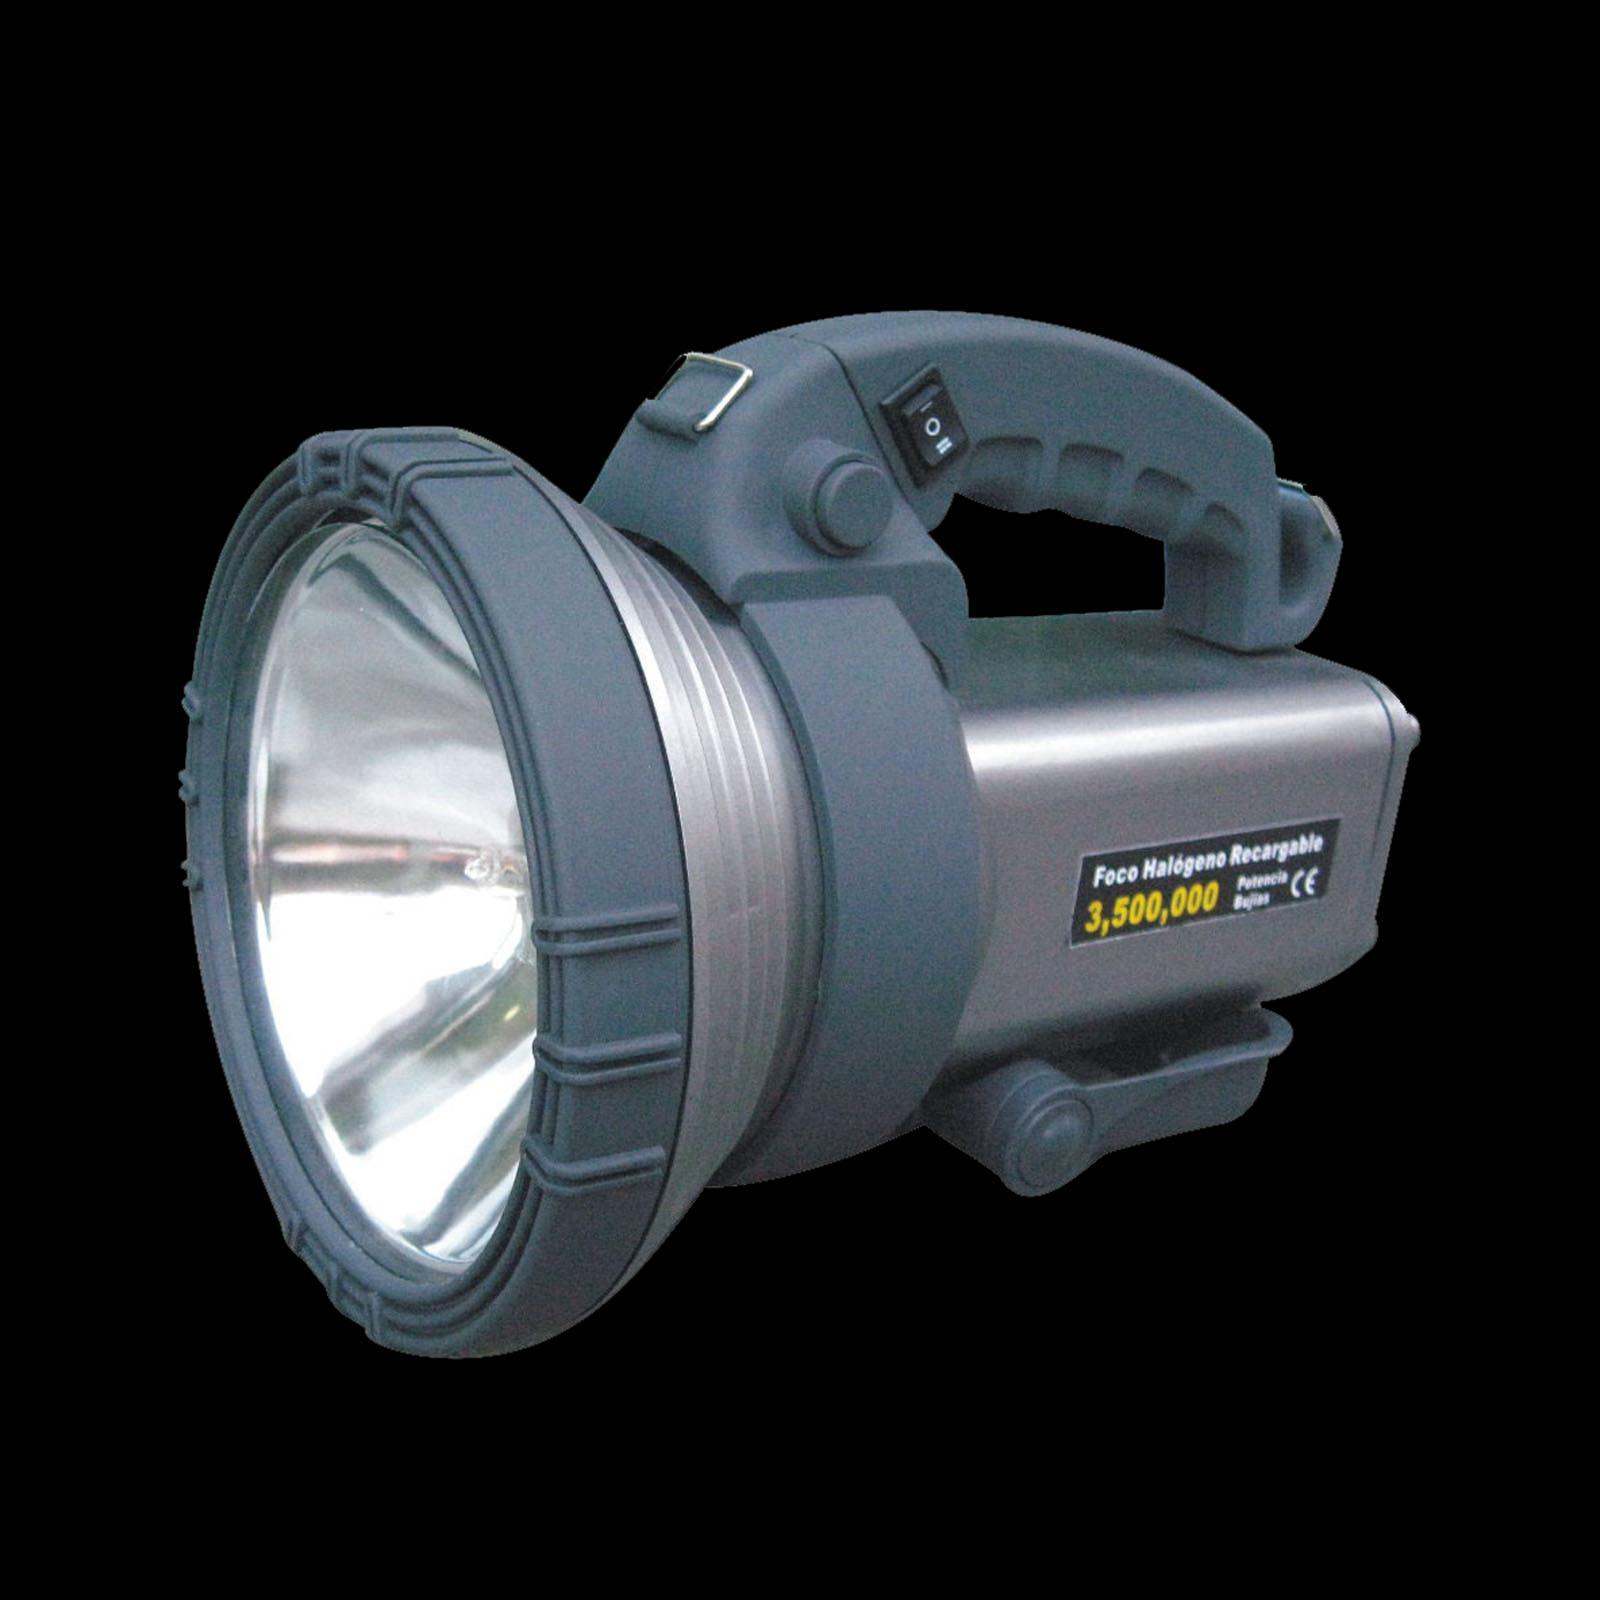 Hand Led Spot Battery Light Portable Rechargeable Spotlight High